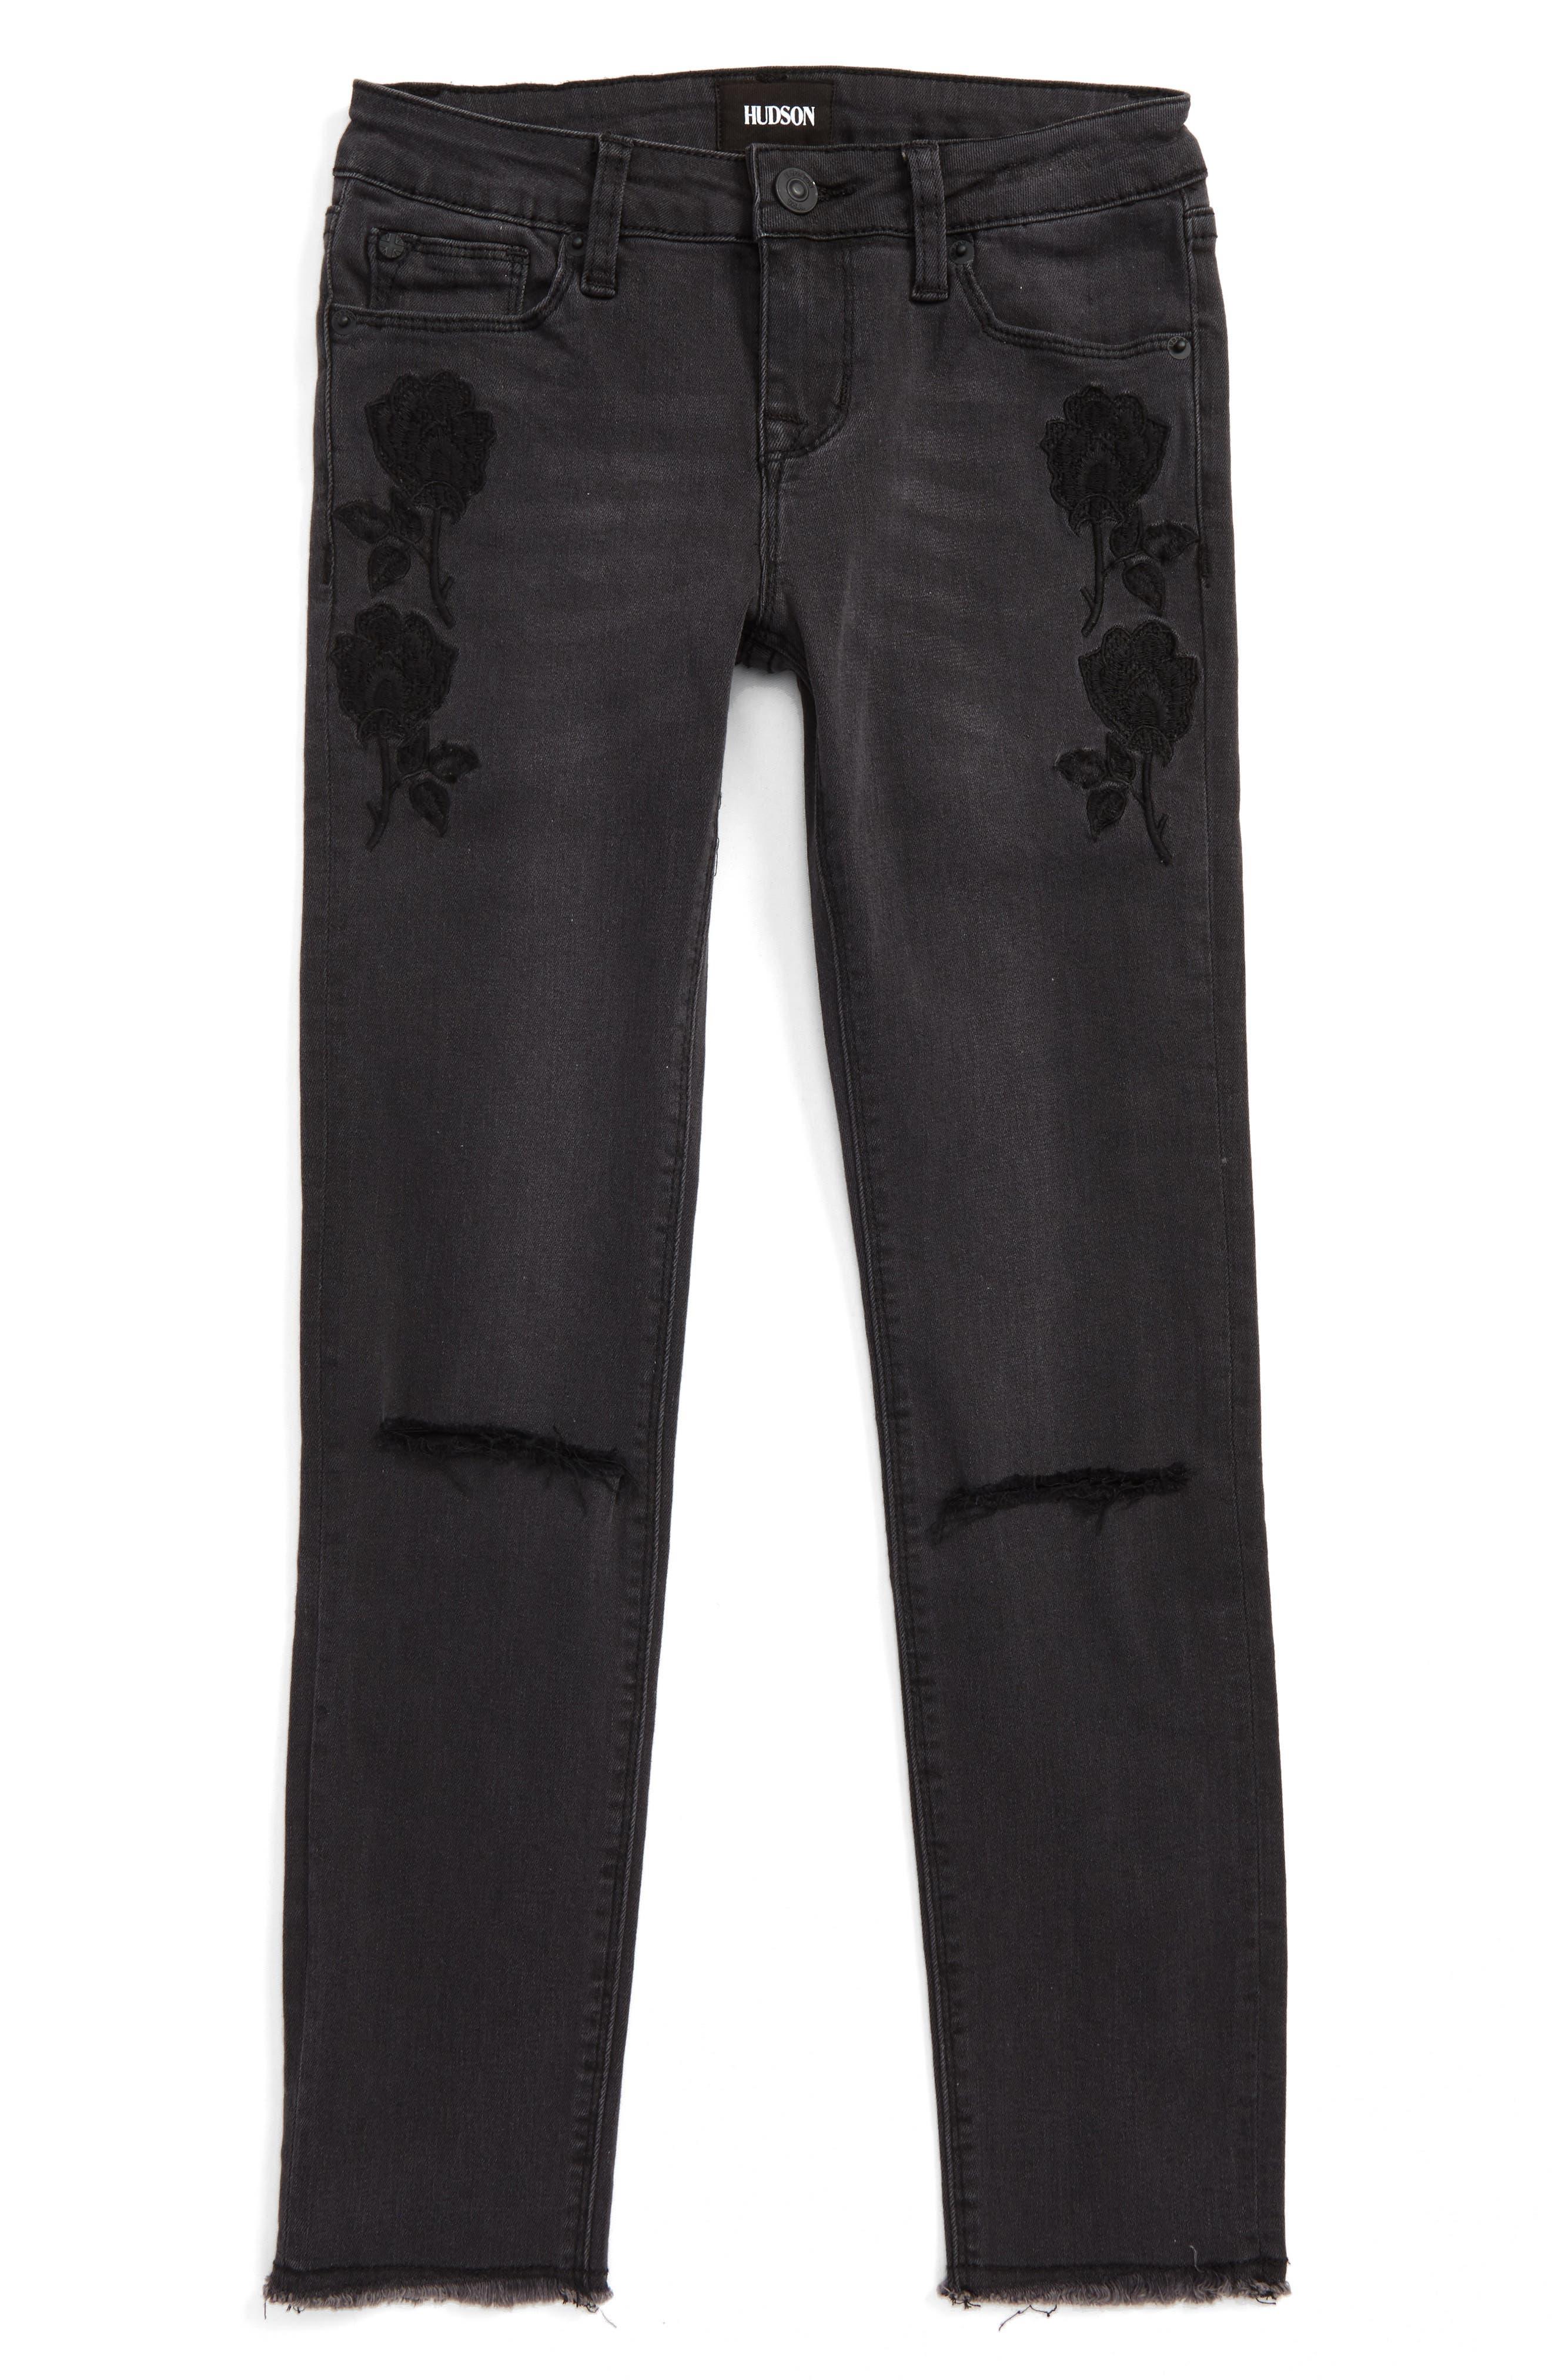 Alternate Image 1 Selected - Hudson Kids Black Iris Skinny Jeans (Big Girls)